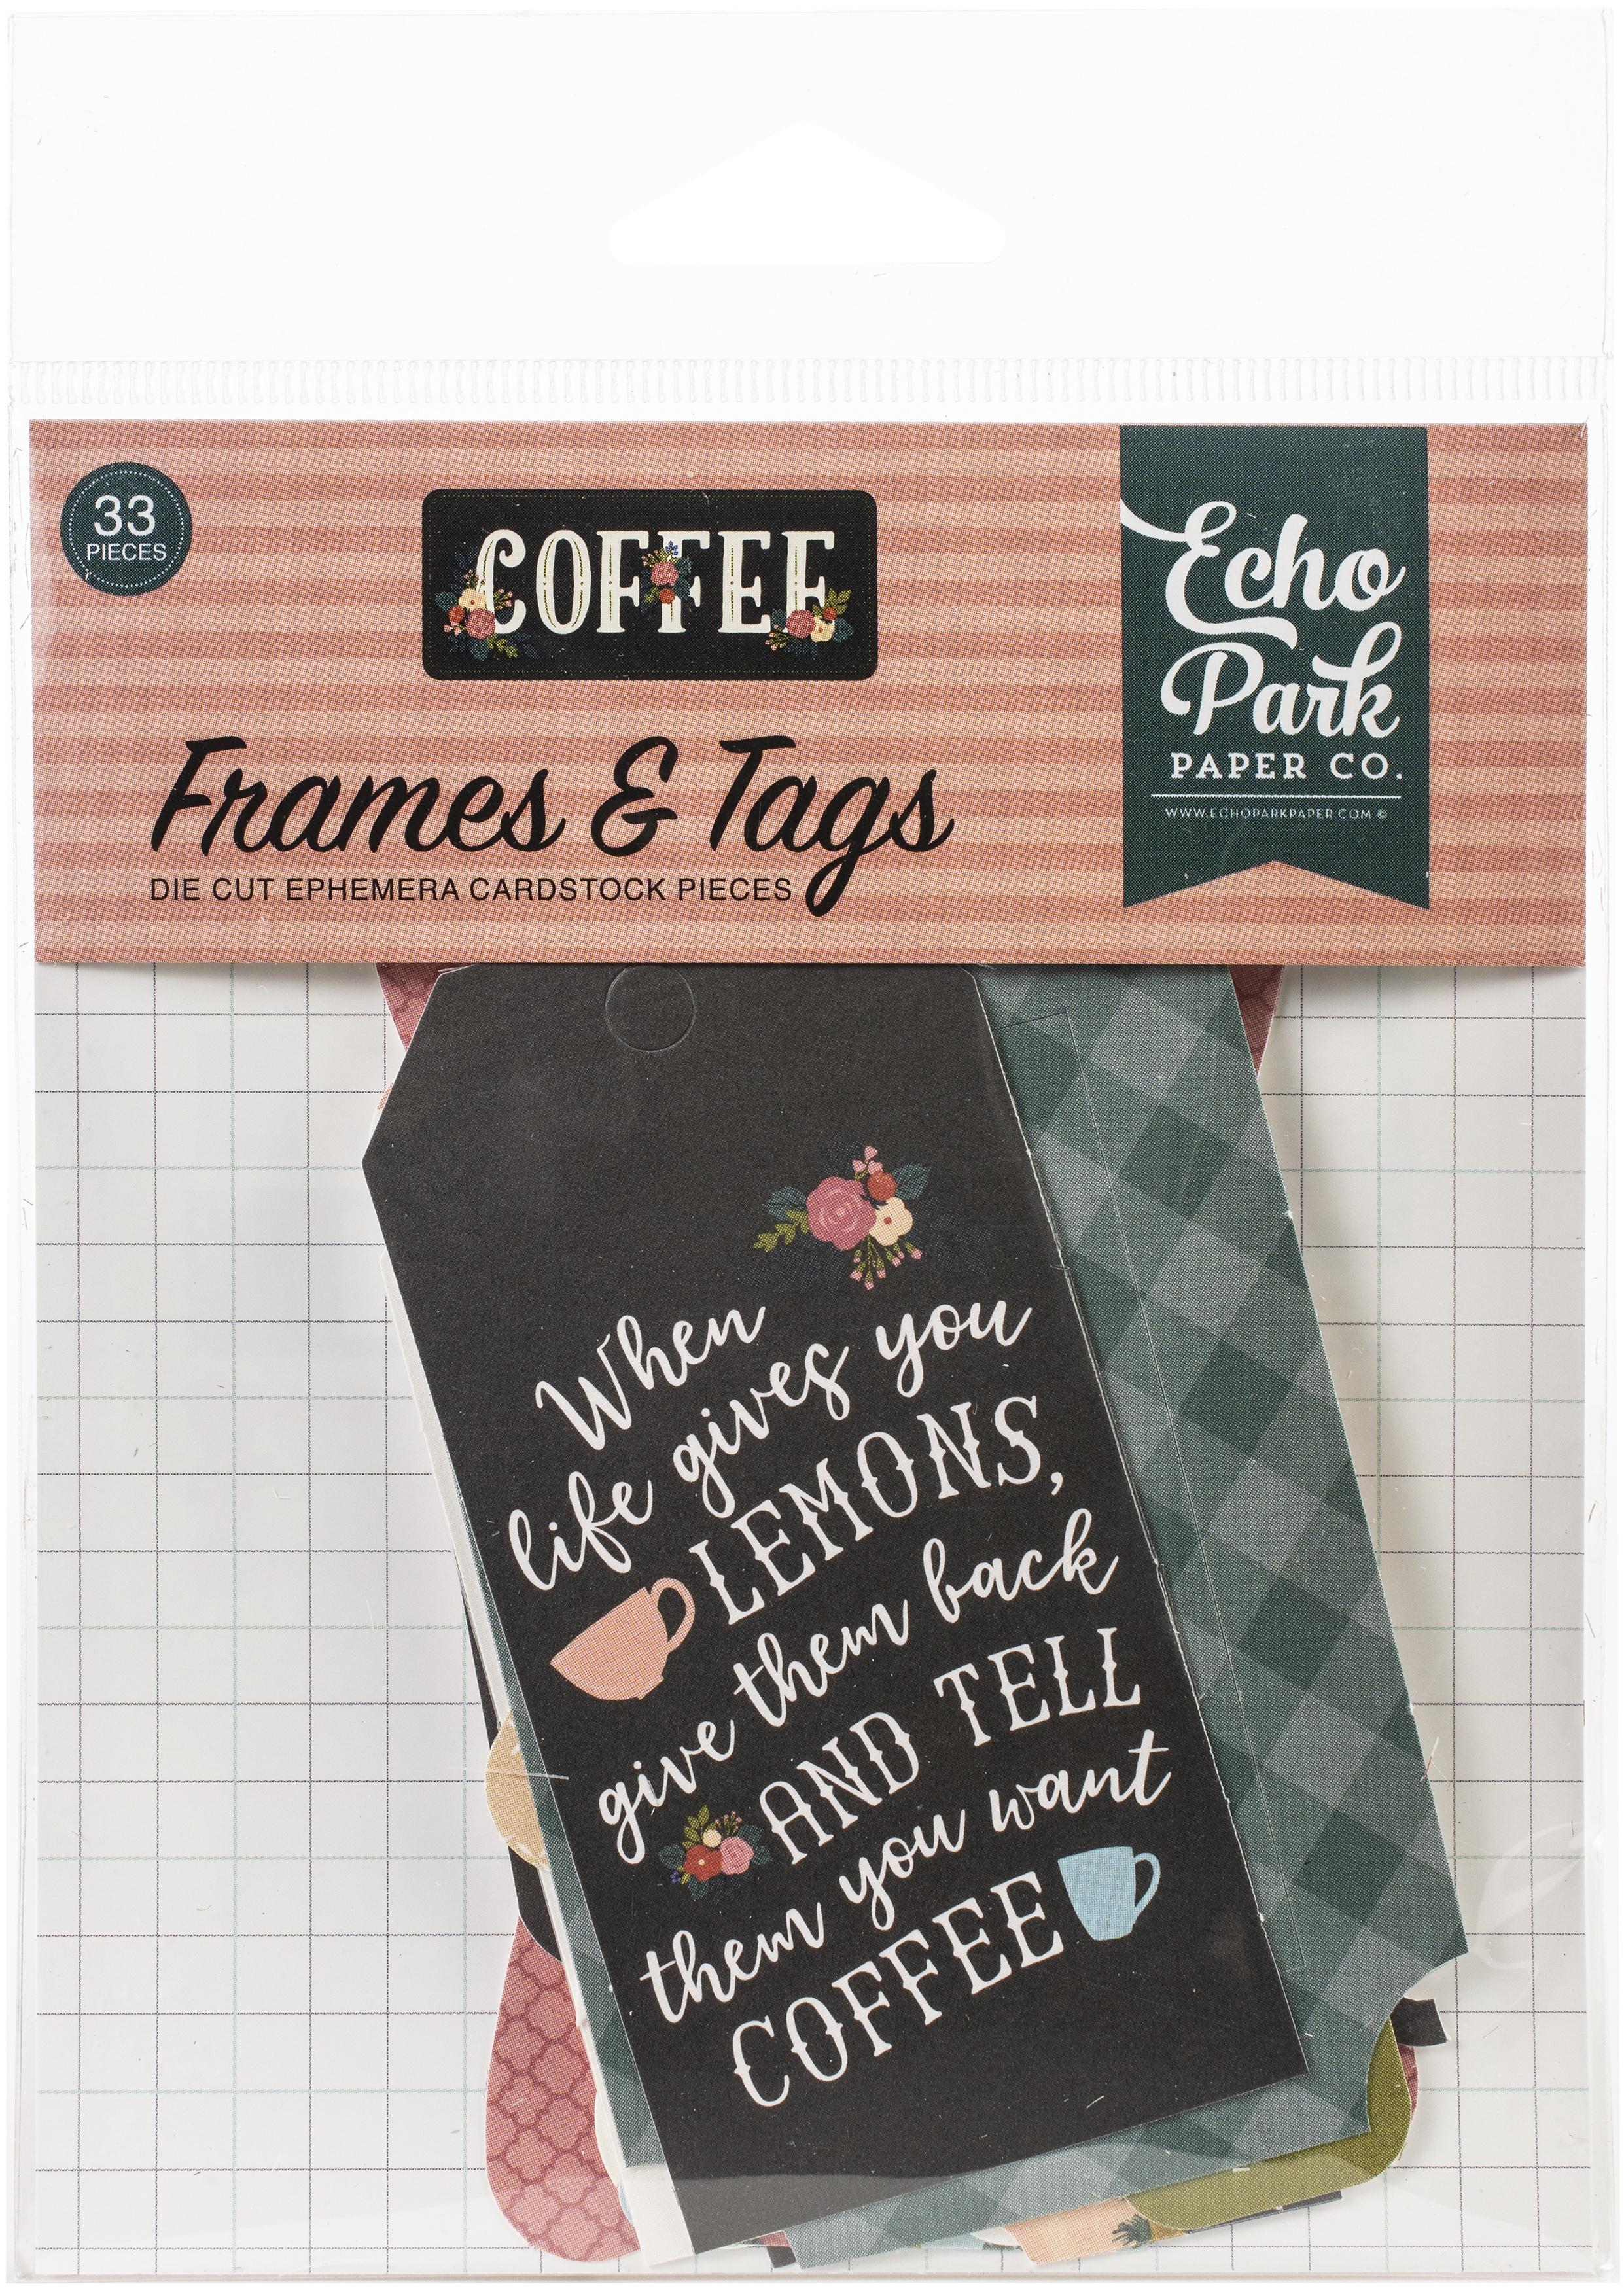 Echo Park Frames & Tags Coffee